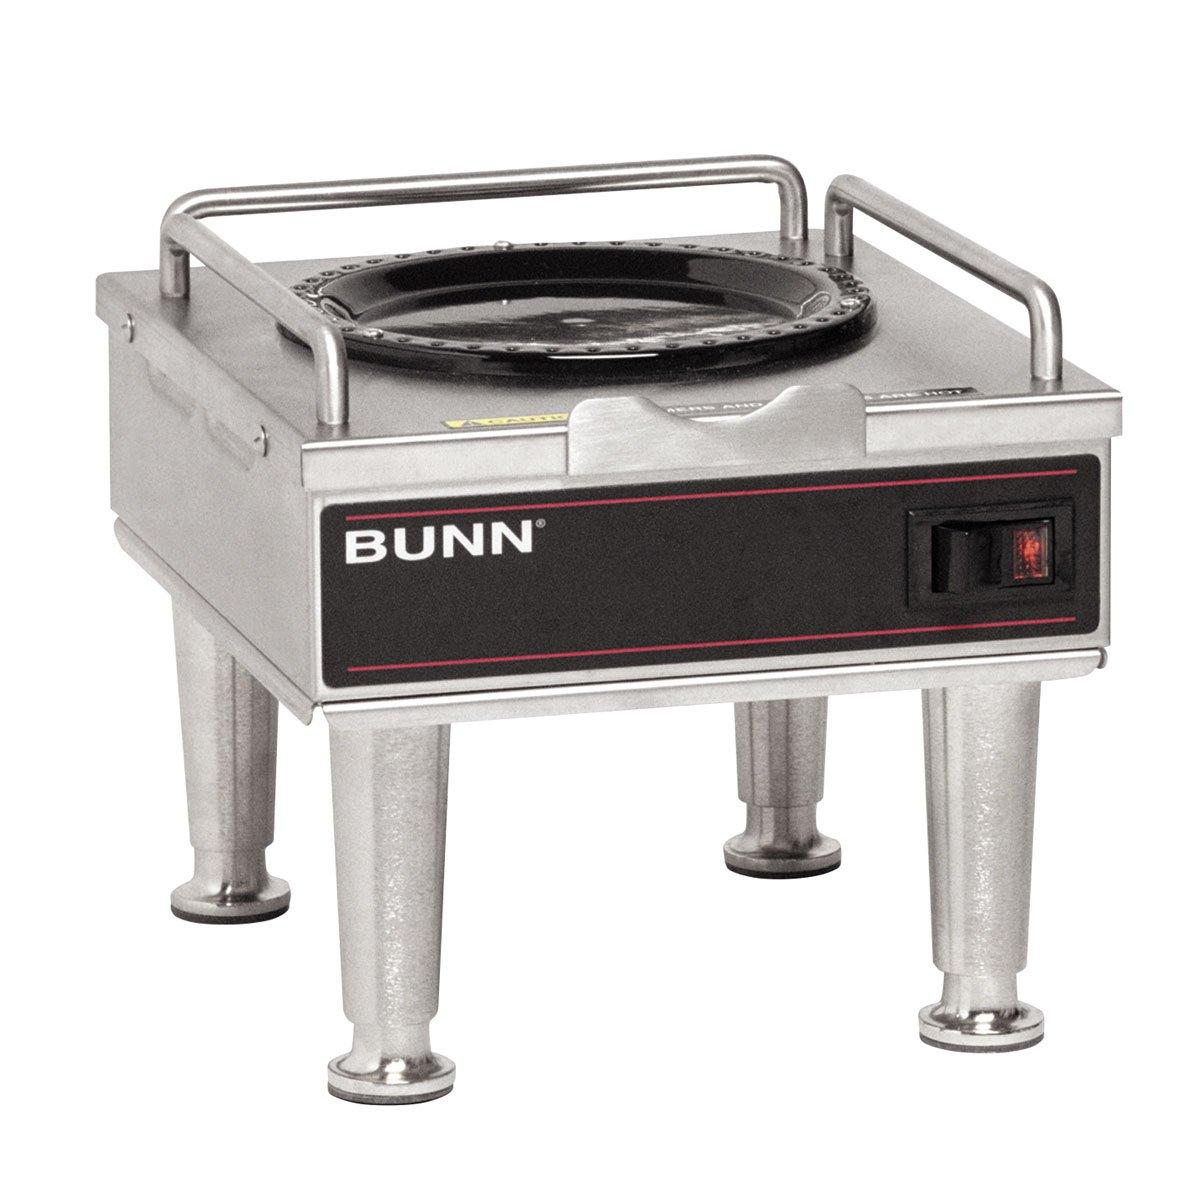 Bunn 12203.0014 12203.0014 RWS1 Satellite Brewer Warmer (For Use with 1GPR & 1.5GPR)